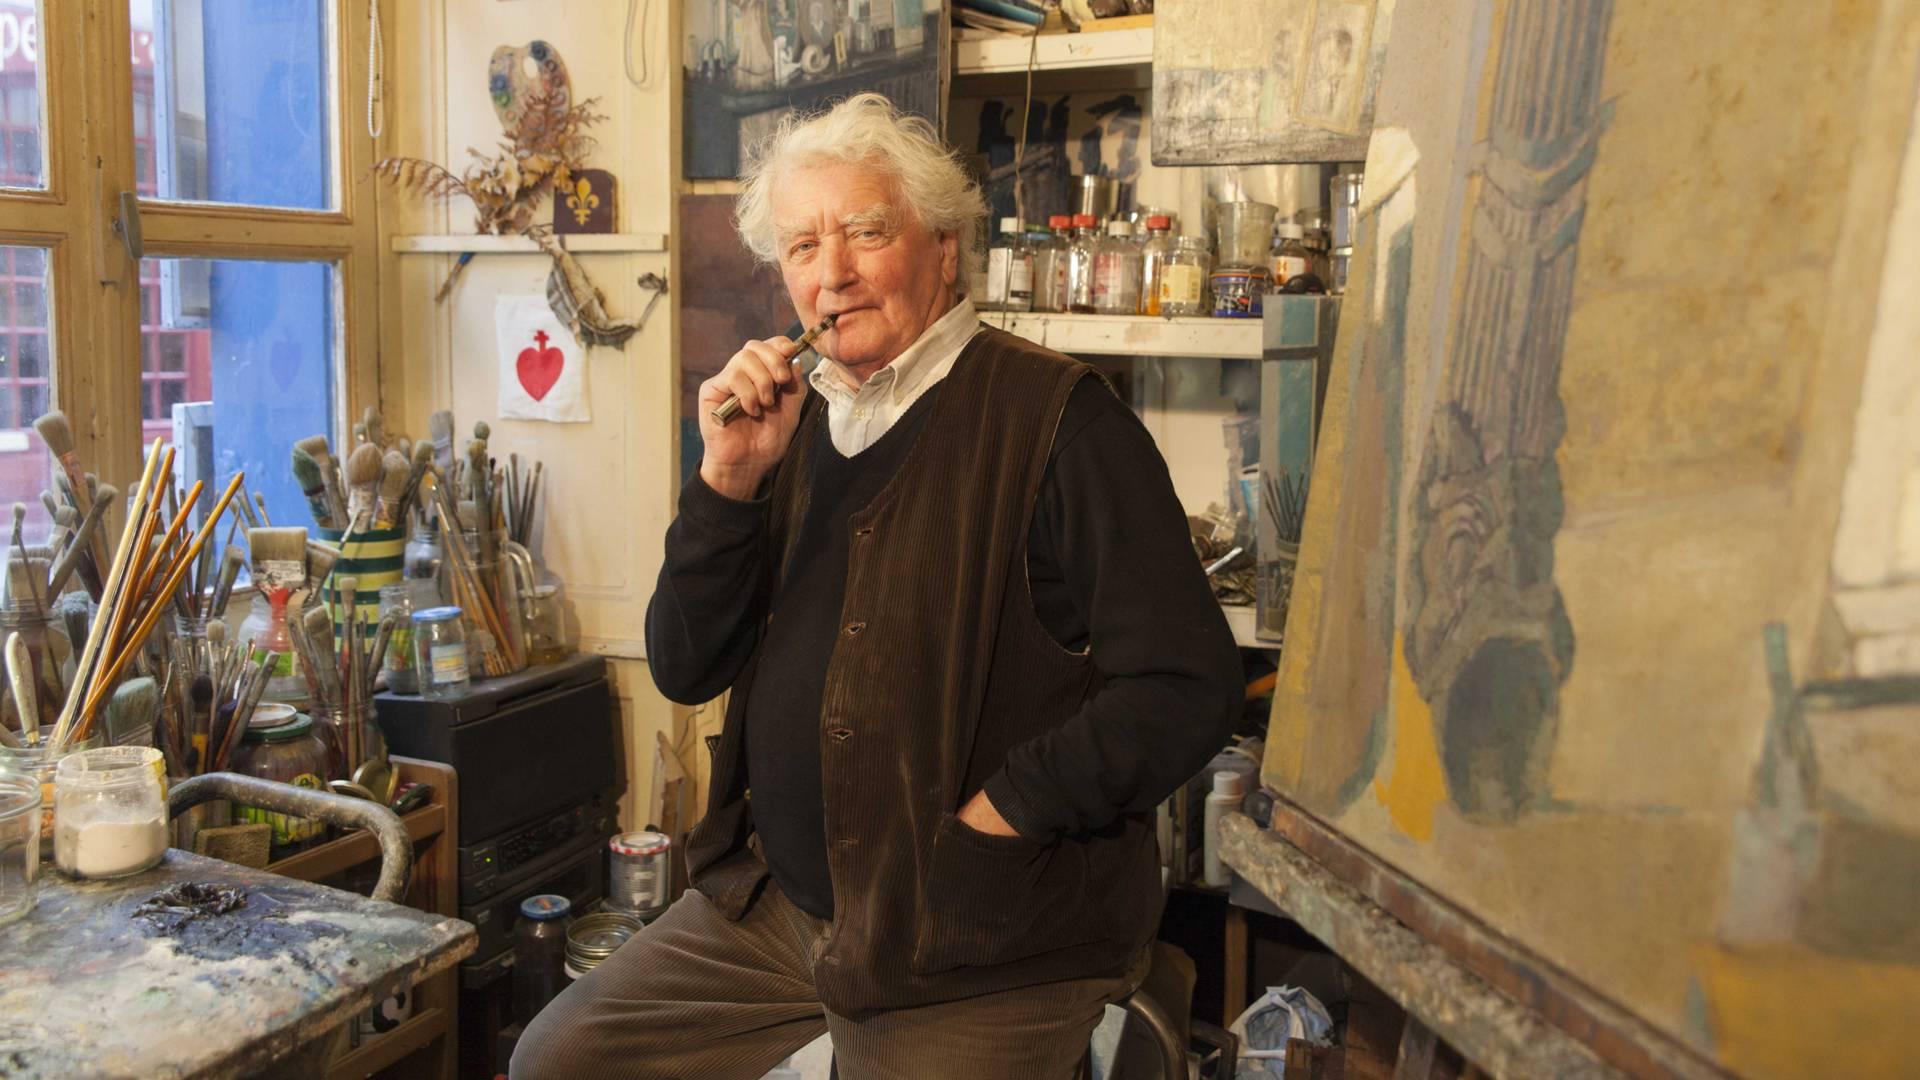 Artistes Granville rue des Juifs Manche Normandie